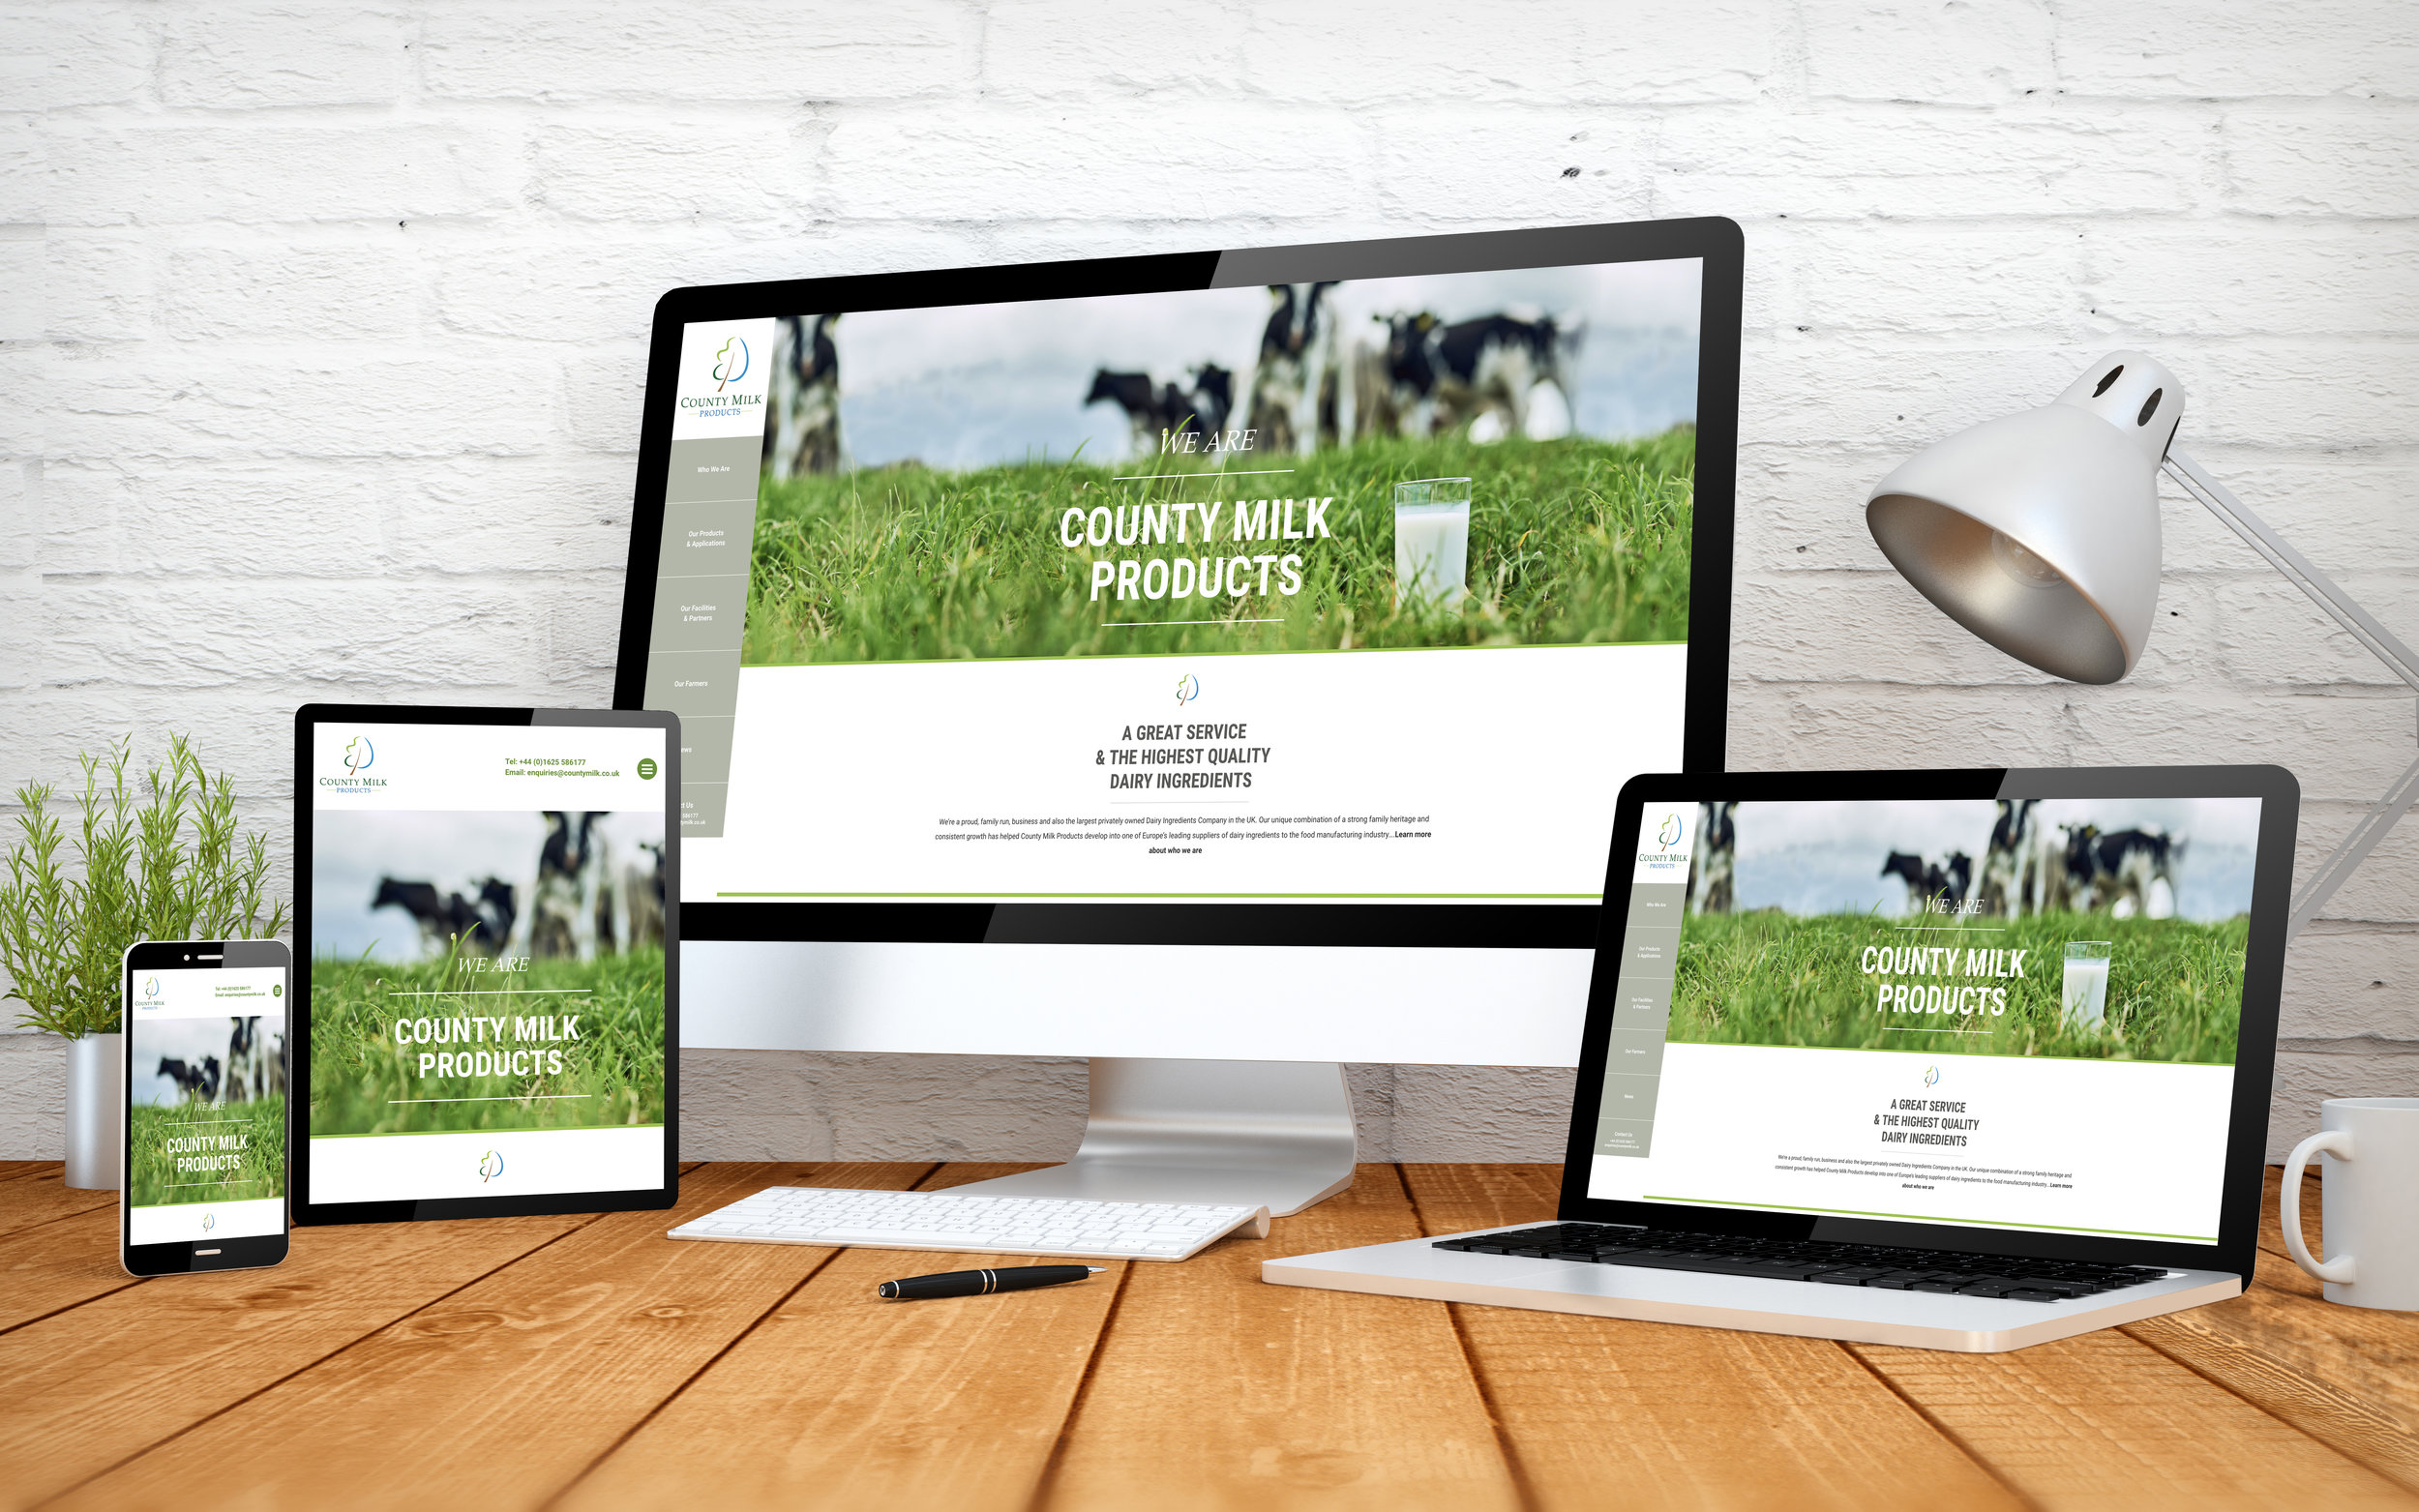 County Milk Products Website Design